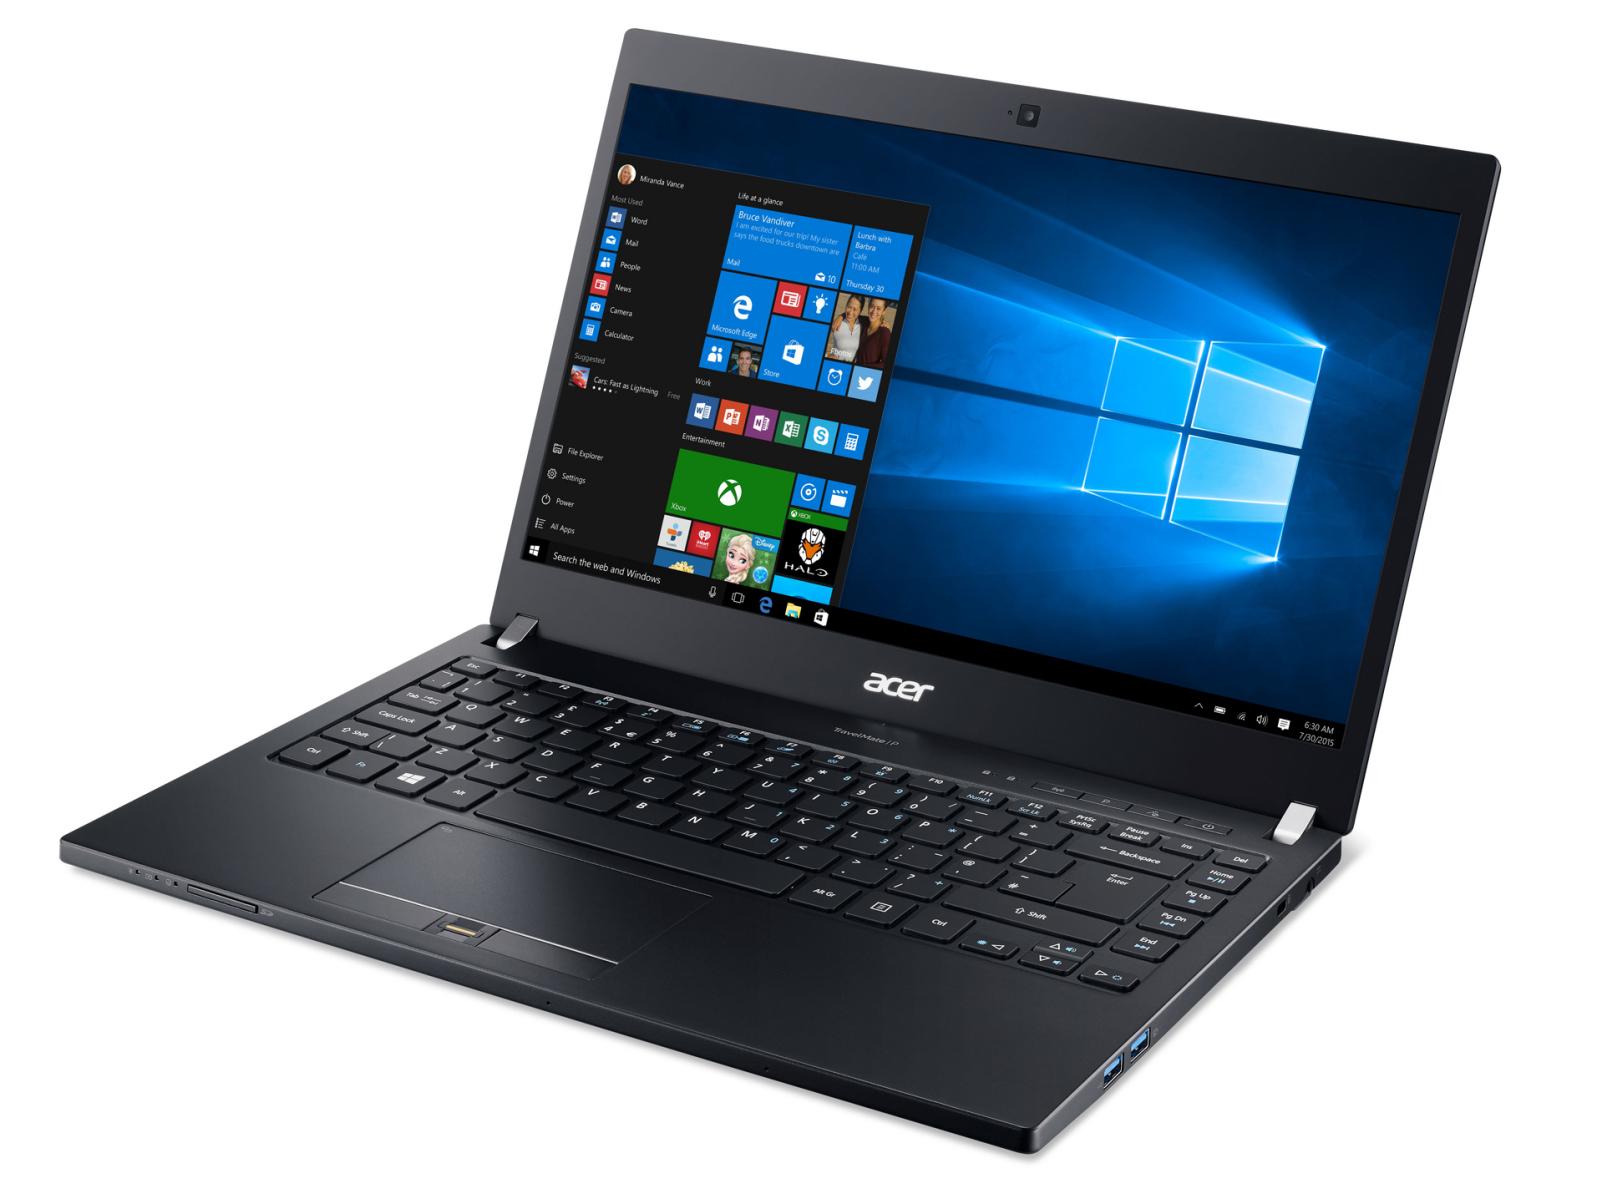 Acer Travelmate P648 M 757n Notebookcheck Net External